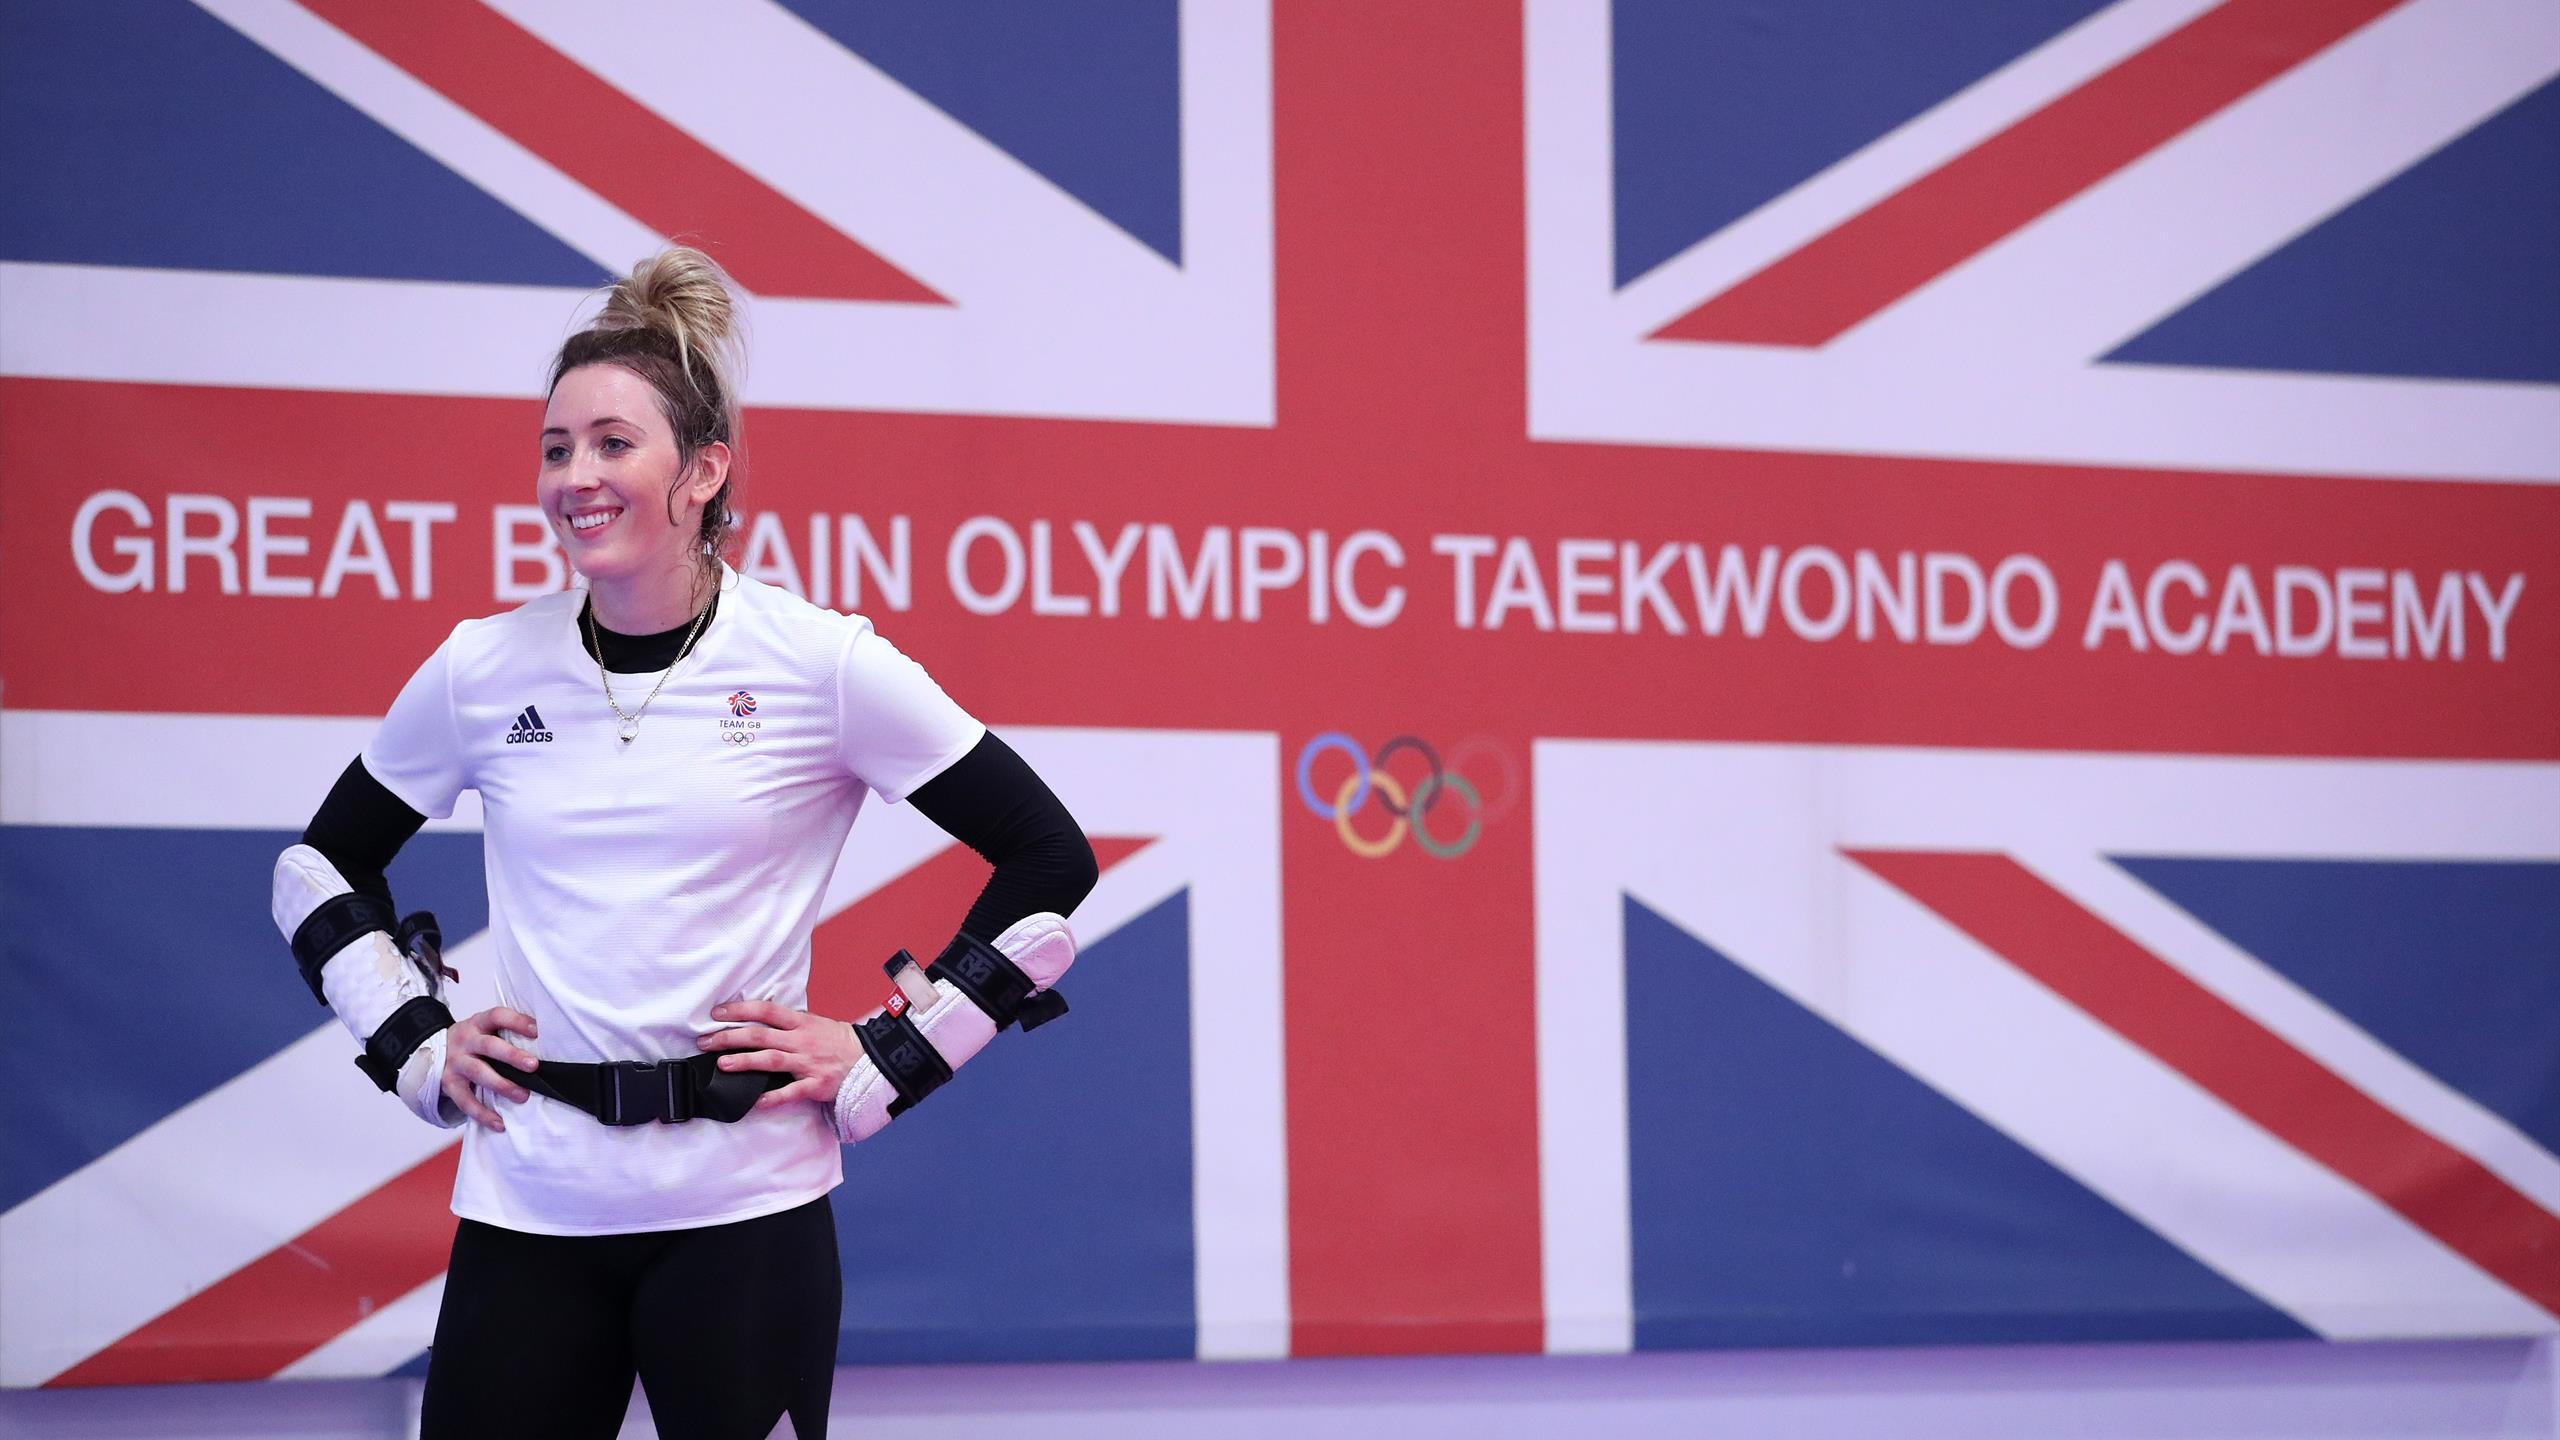 Tokyo 2020 Olympics: What to Watch Today, July 25 - Schedule, events, TV livestream, Jade Jones, Simone Biles in action.